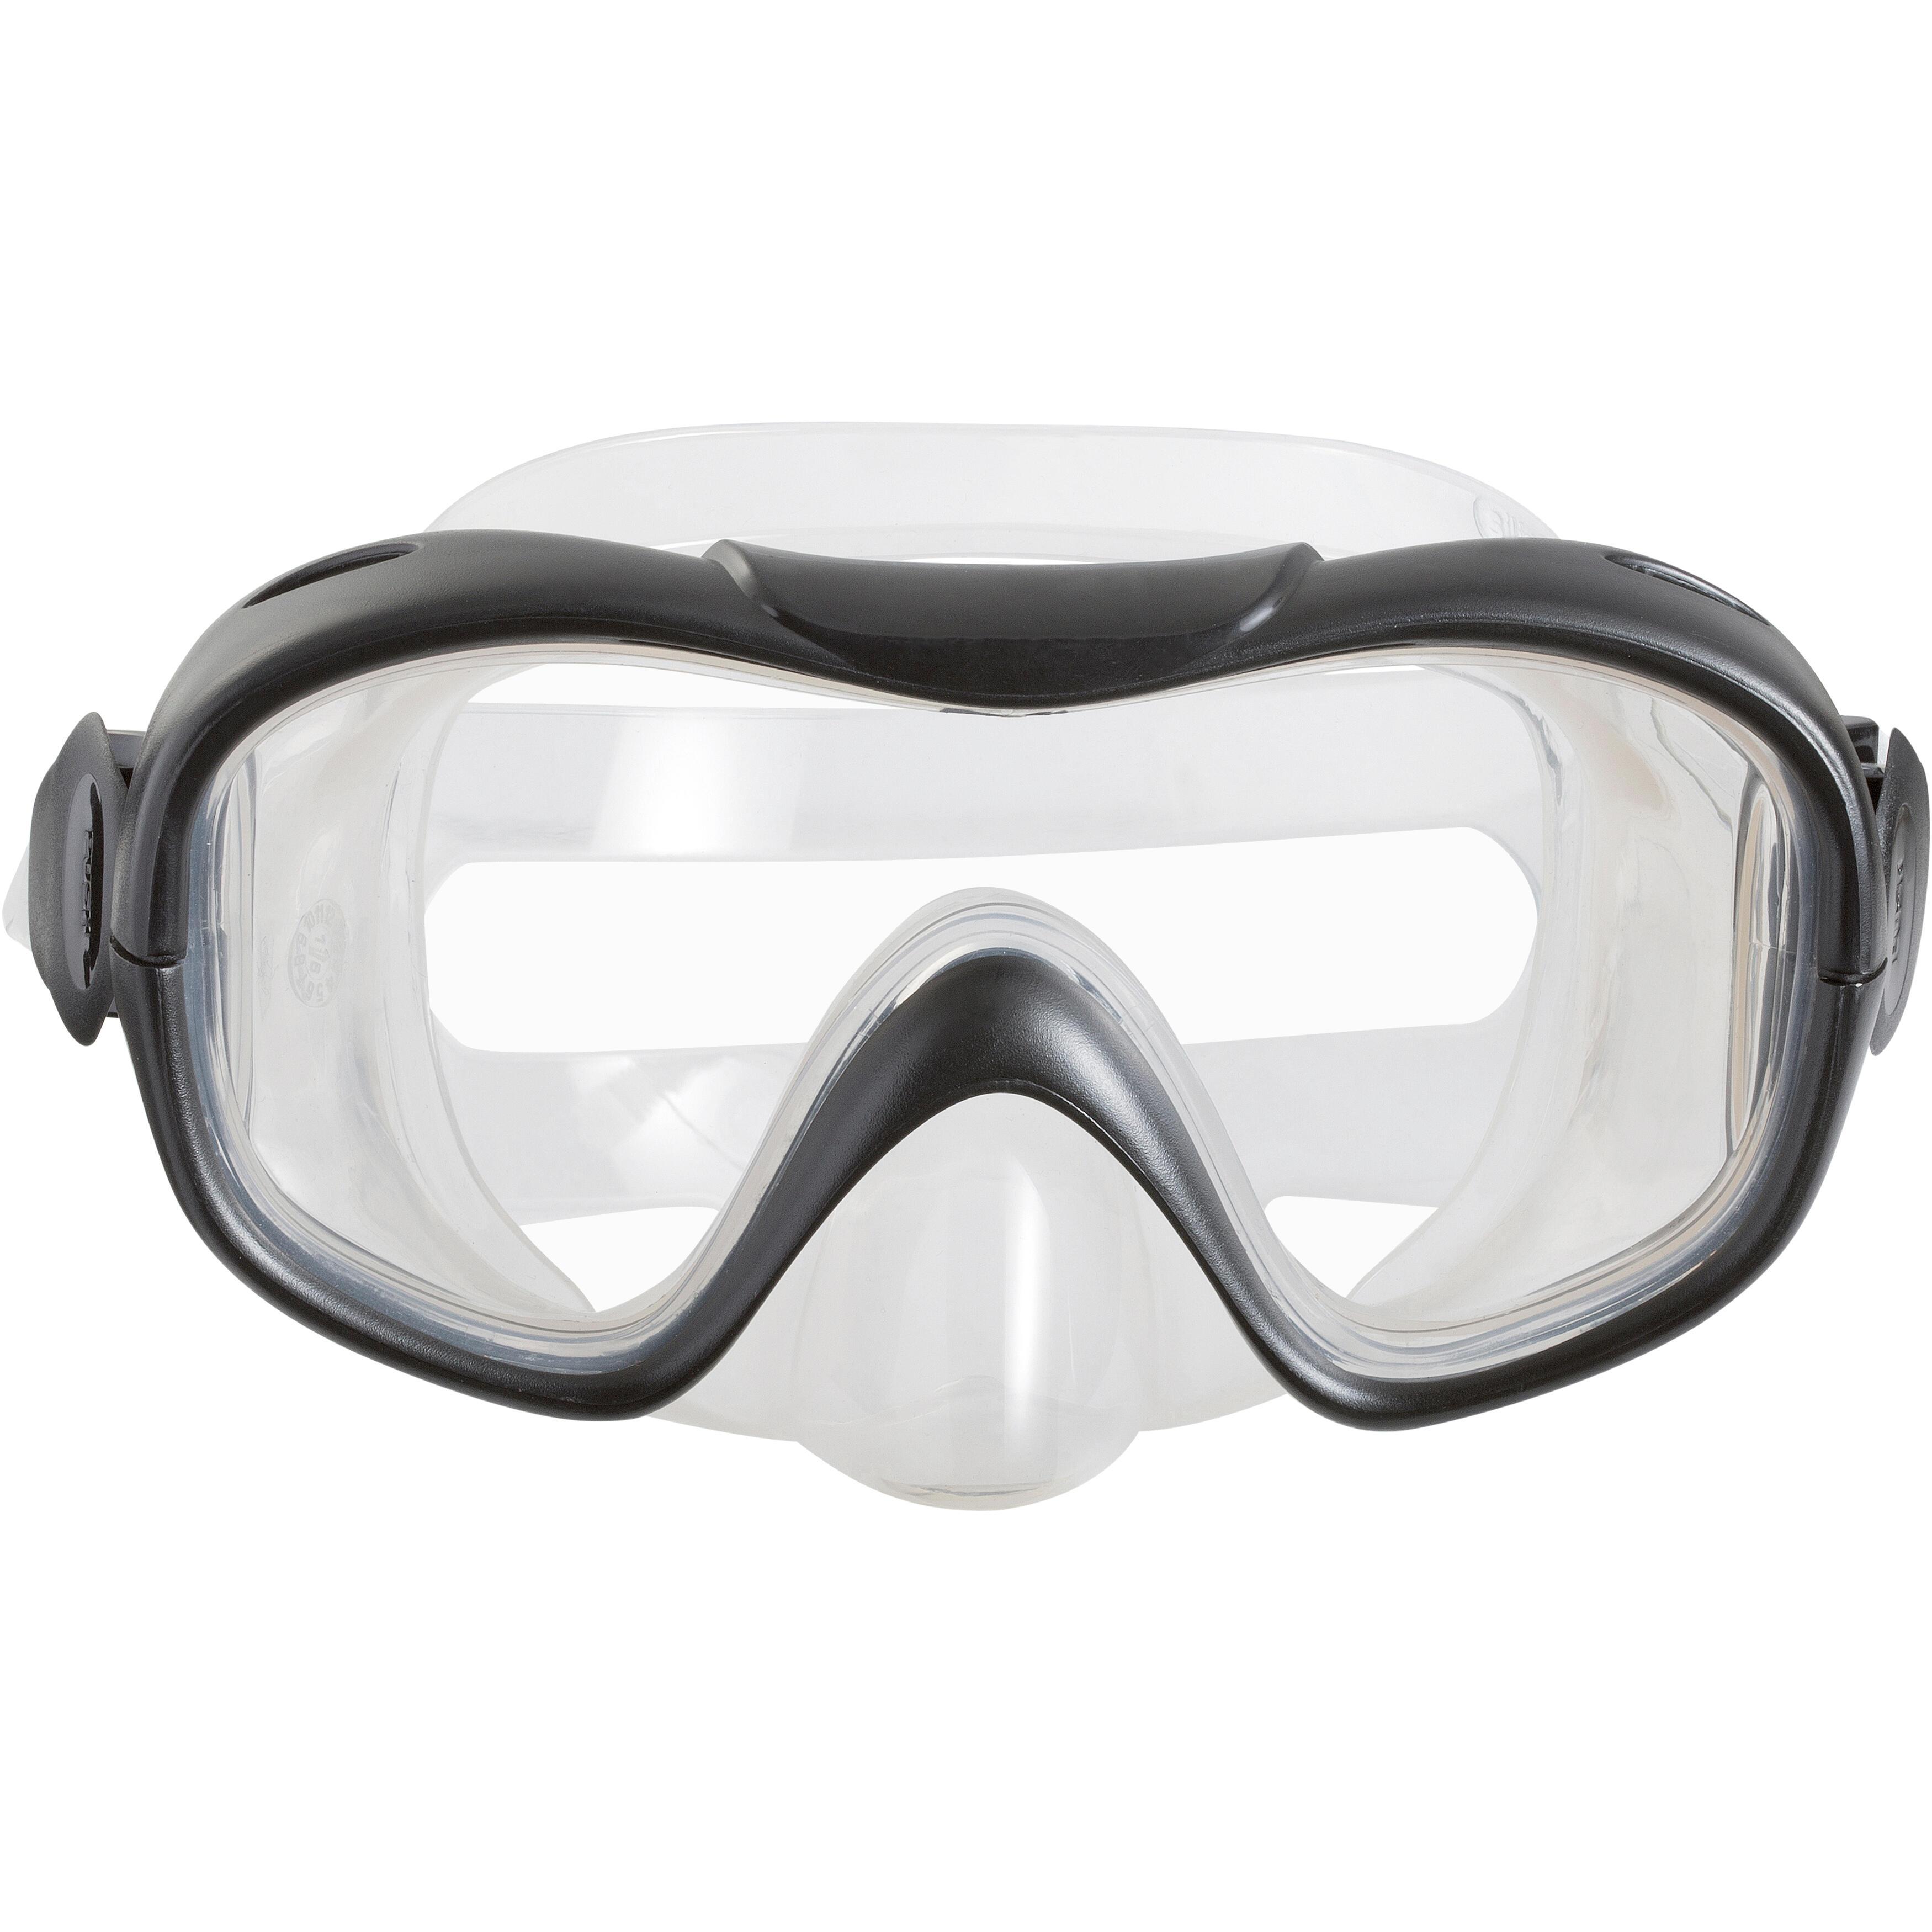 FMS 100 freediving snorkel fins mask kit for adults blue black